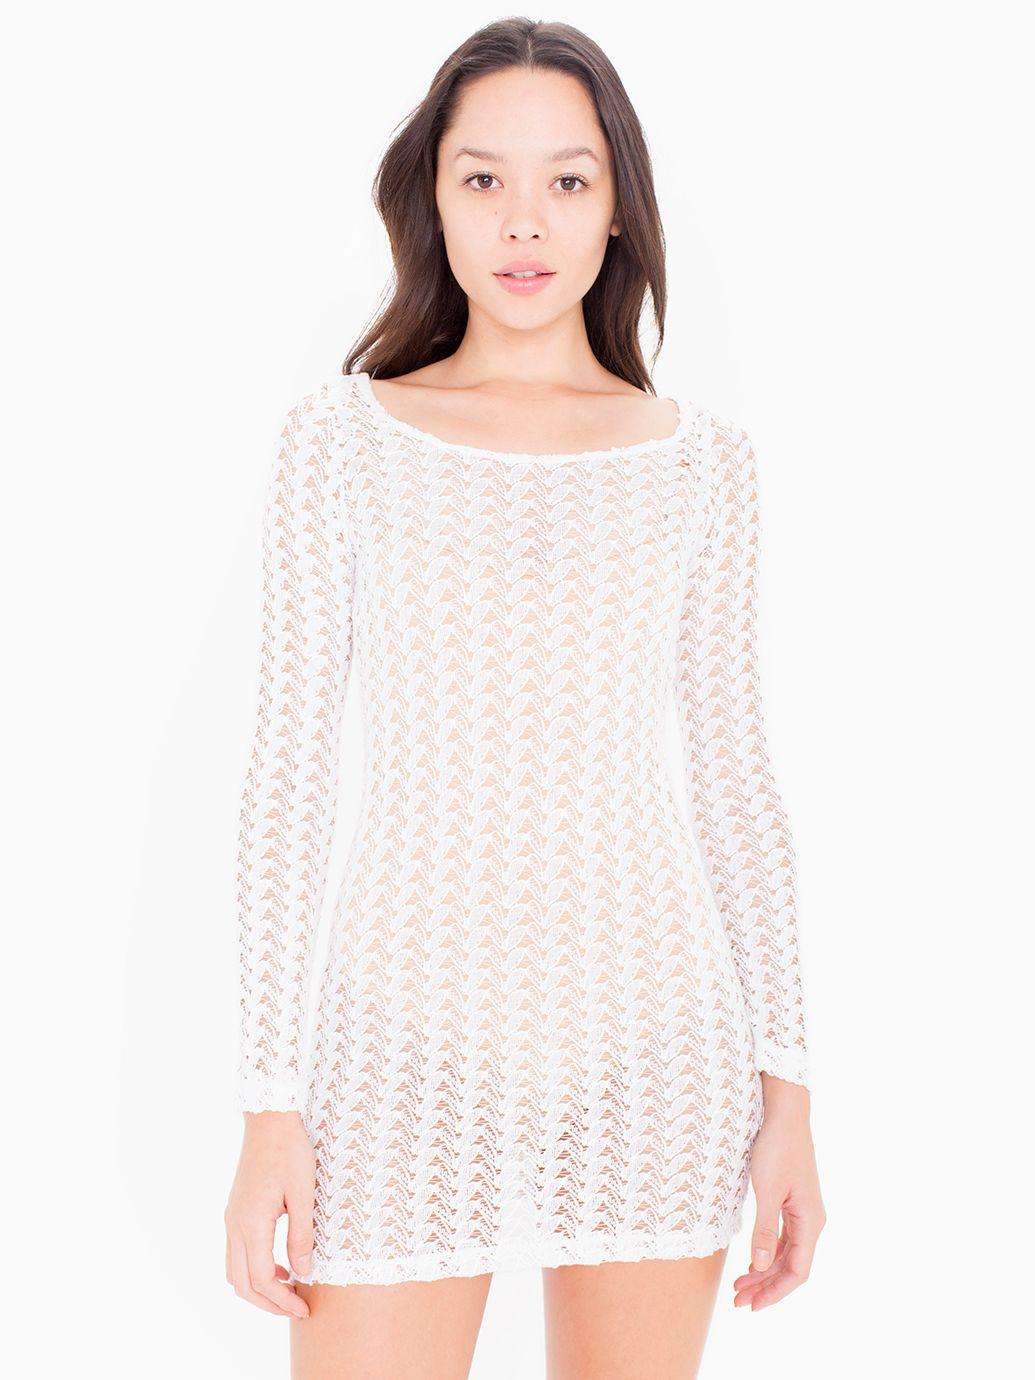 White turtleneck dress long sleeve